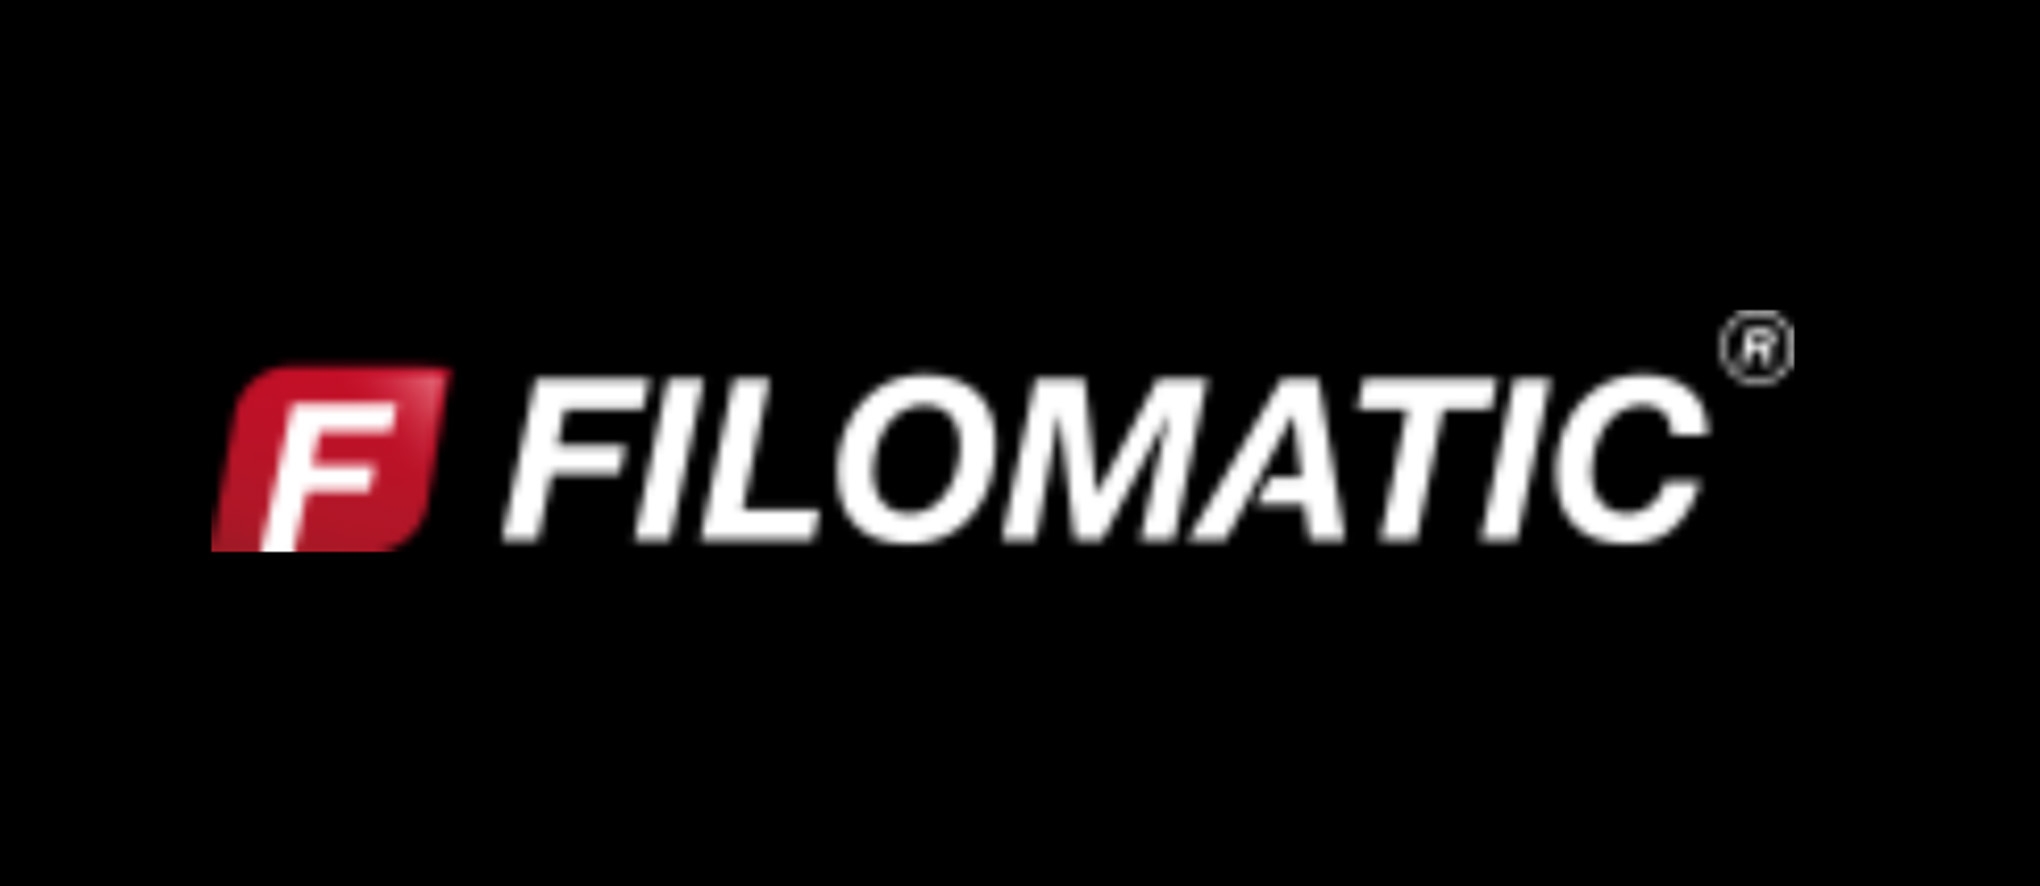 filomatic logo